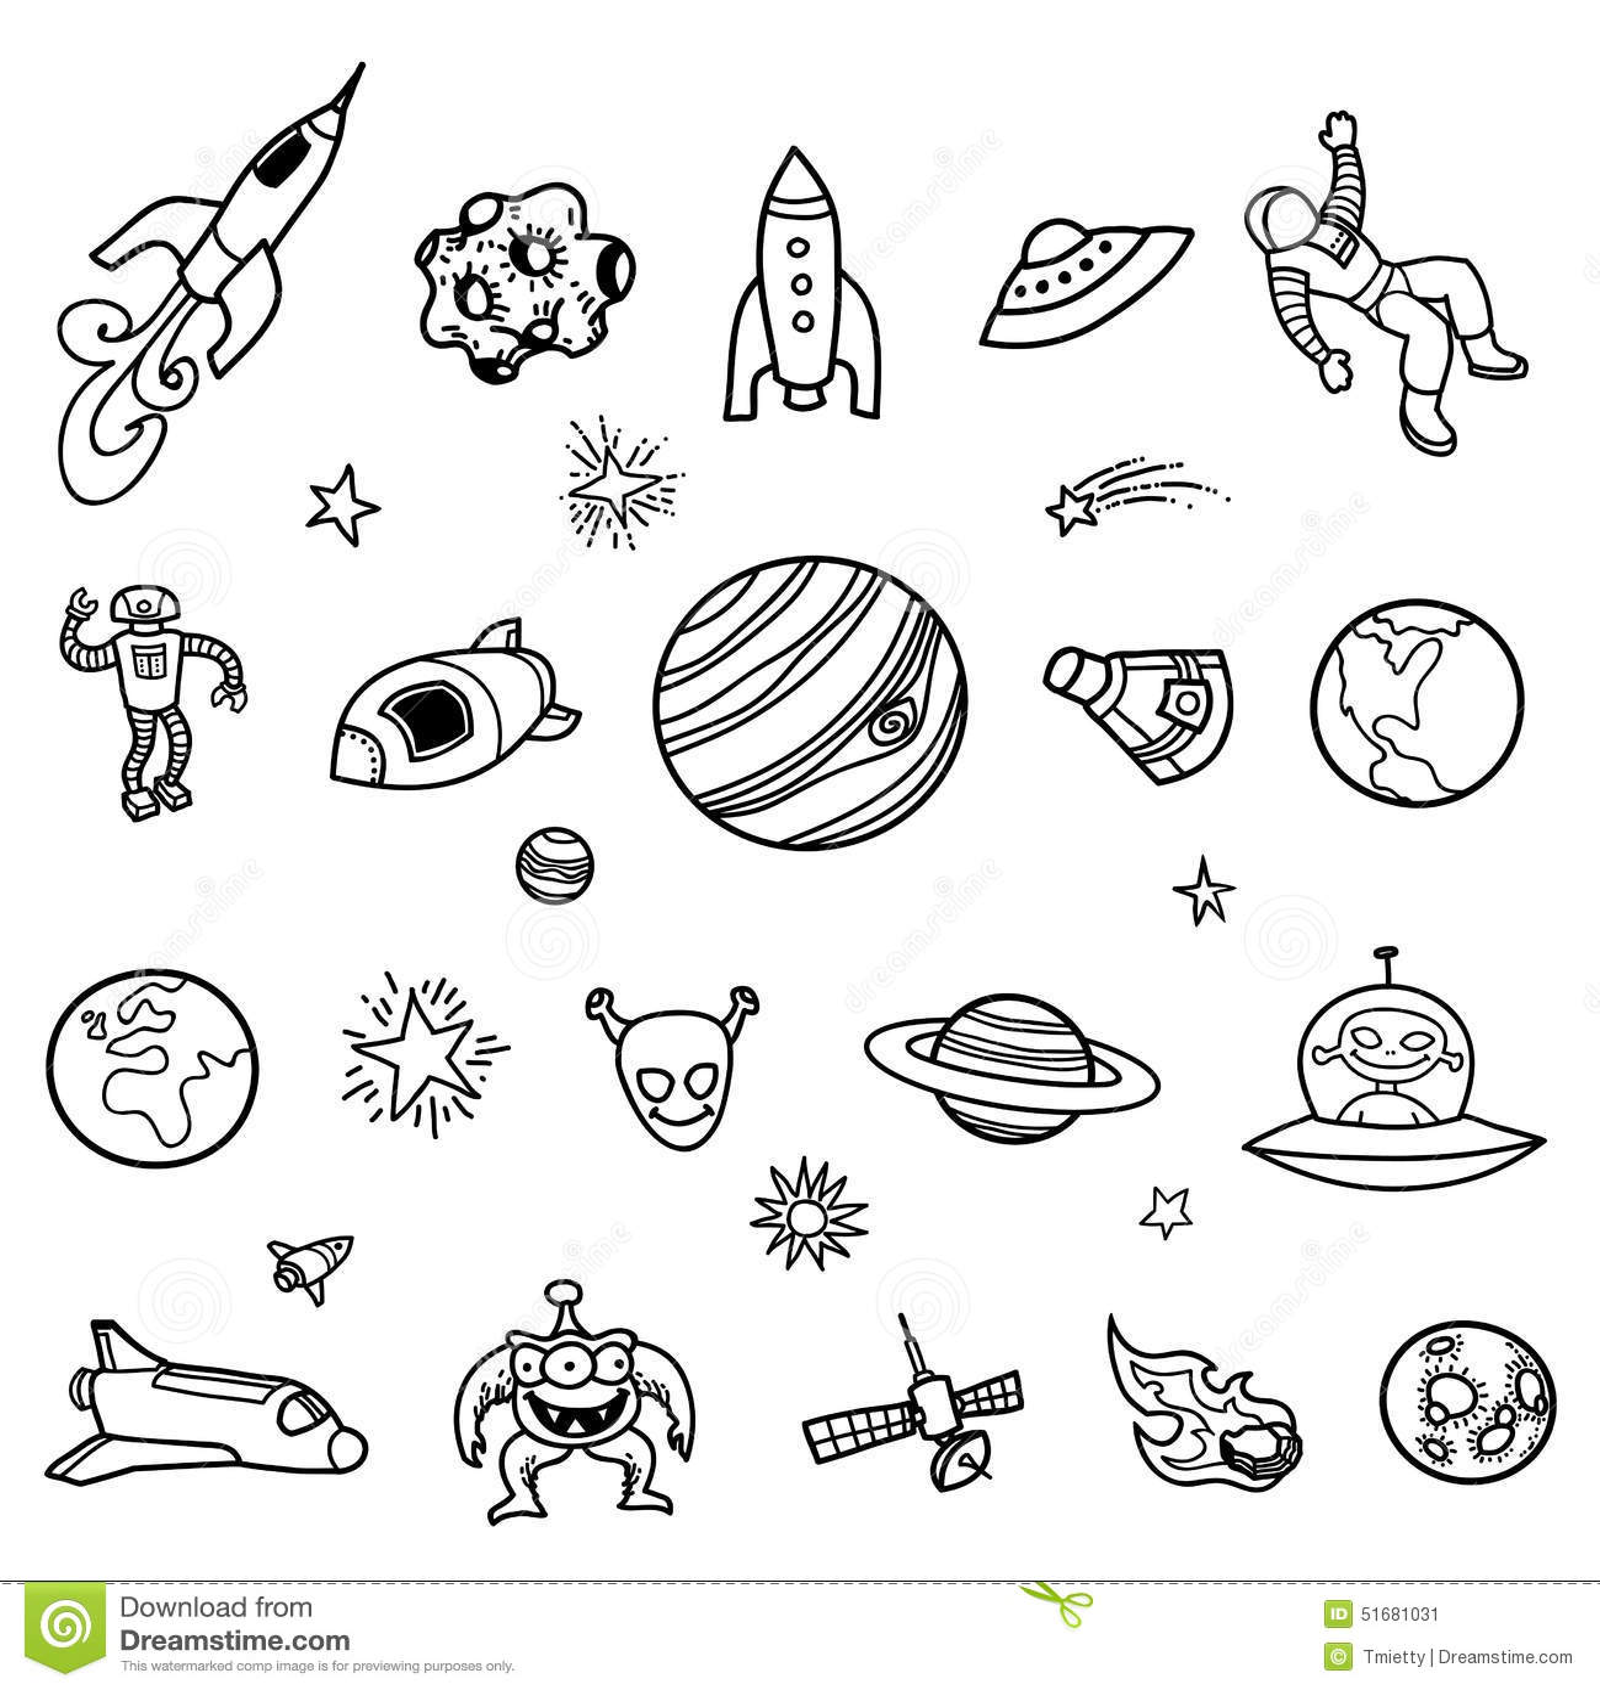 Garatujas Desenhados A Mao Do Espaco Ilustracao Do Vetor